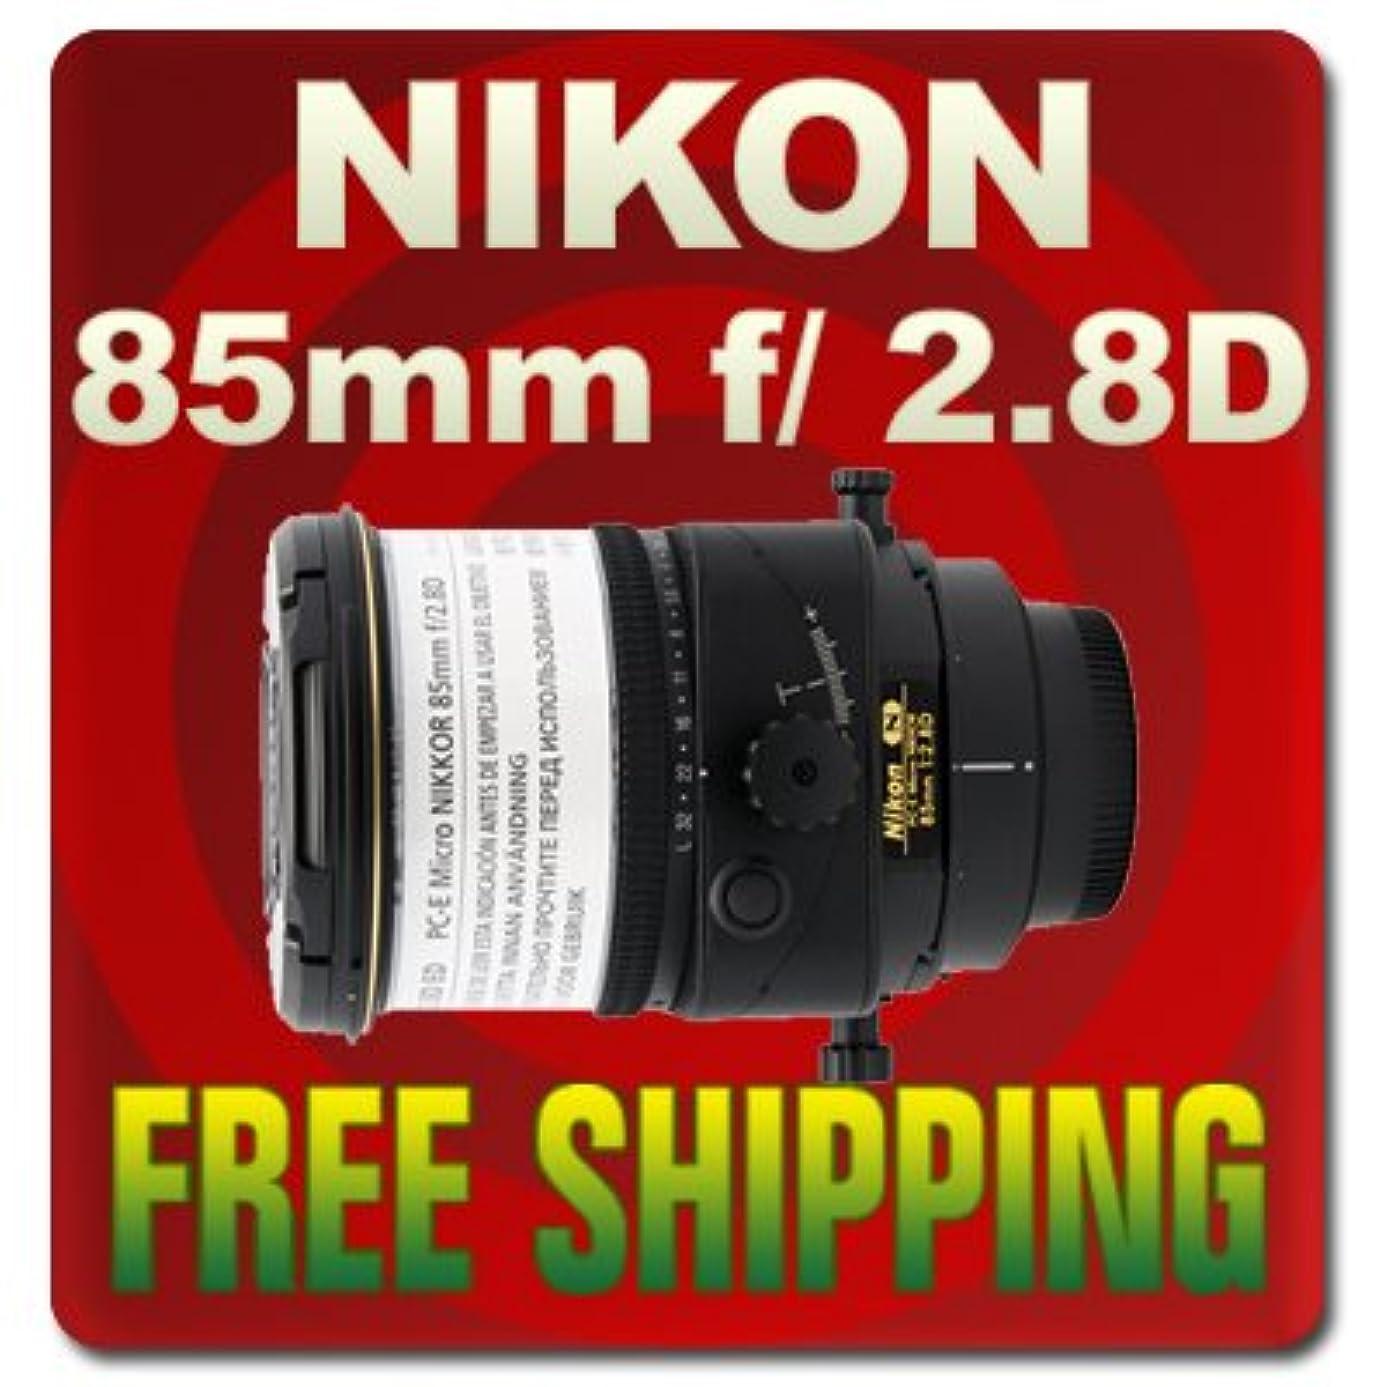 Nikon PC-E FX Micro NIKKOR 85mm f/2.8D Fixed Zoom Lens for Nikon DSLR Cameras International Version (No Warranty)